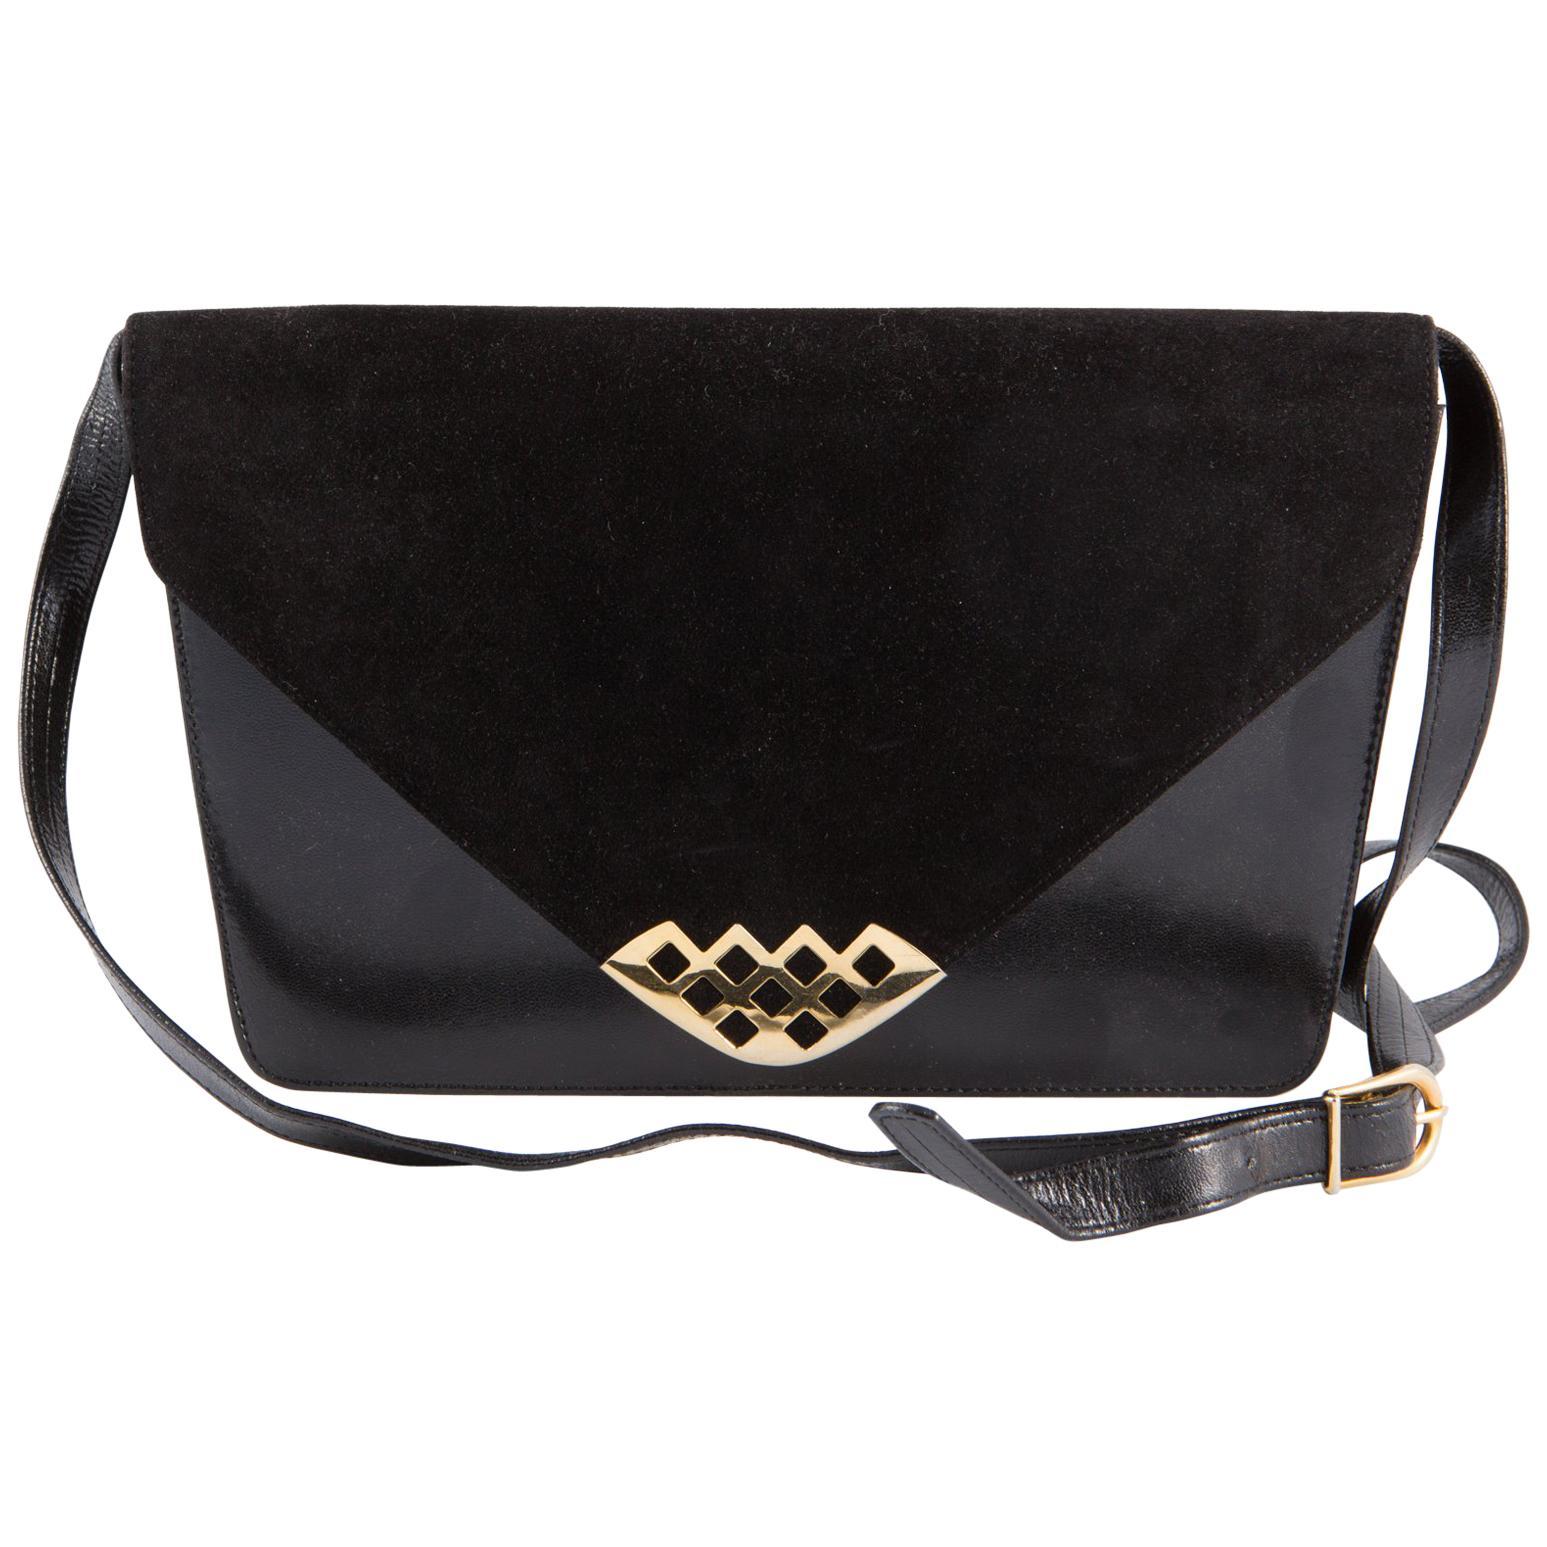 Bally Black Leather and Suede Shoulder Bag